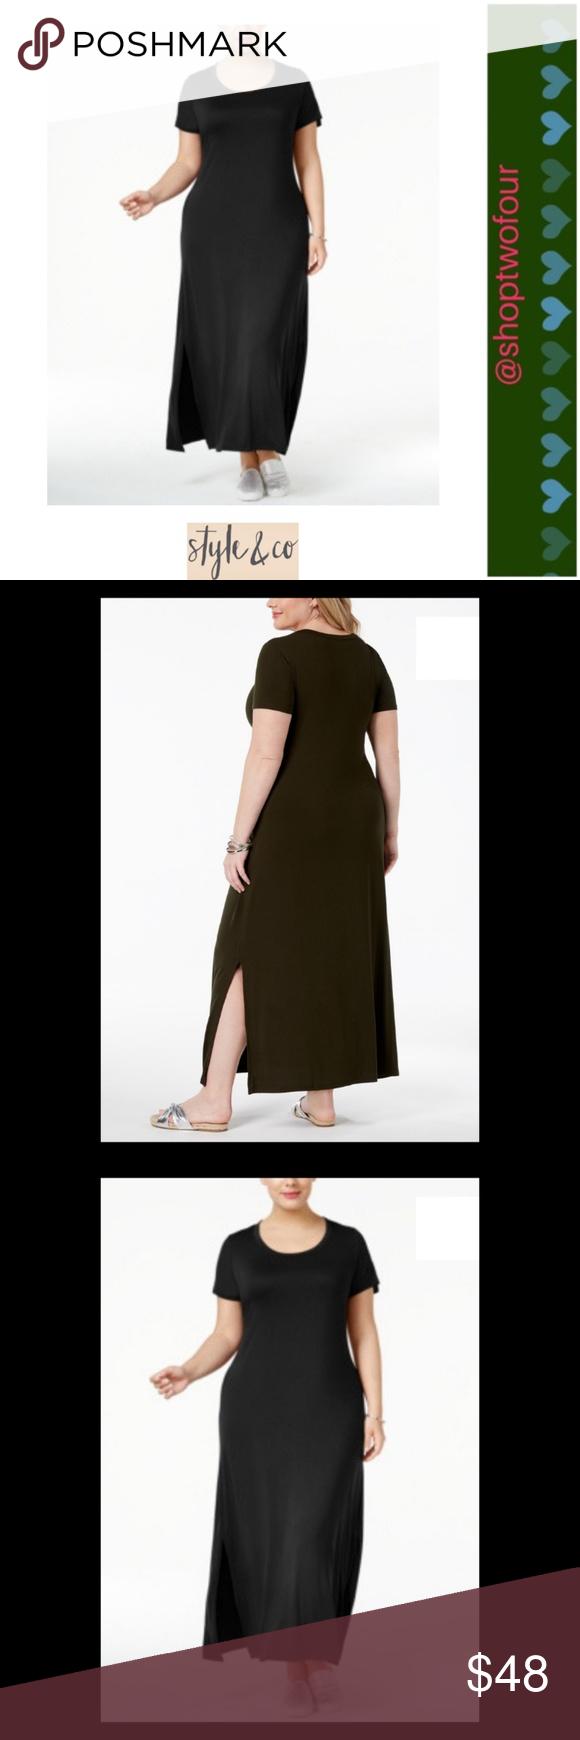 0eeac863cd3 Style   Co Plus Size T-Shirt Maxi Dress Black NWT Style   Co Plus ...